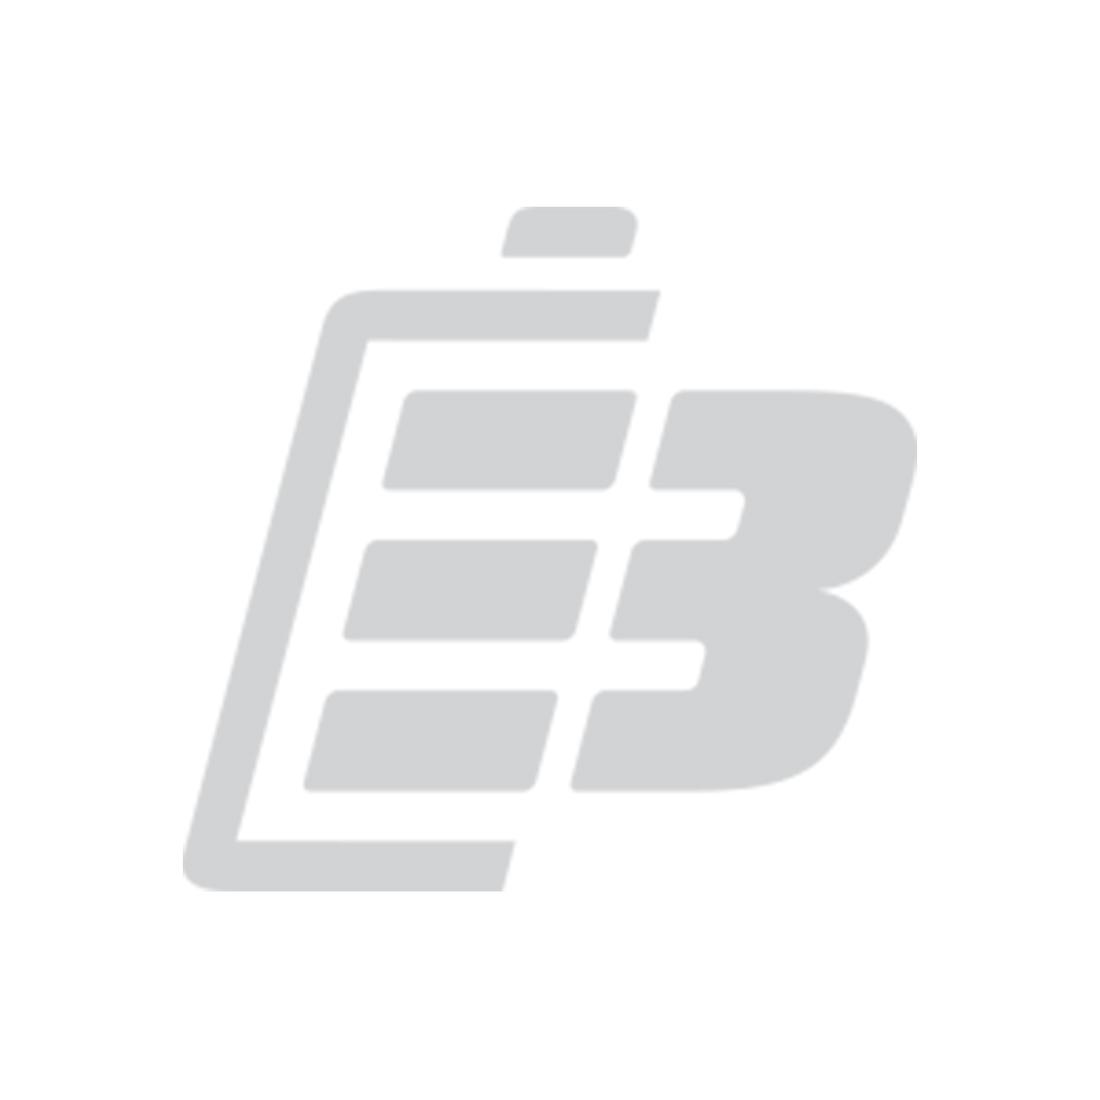 Cordless phone battery Siemens CS240_1